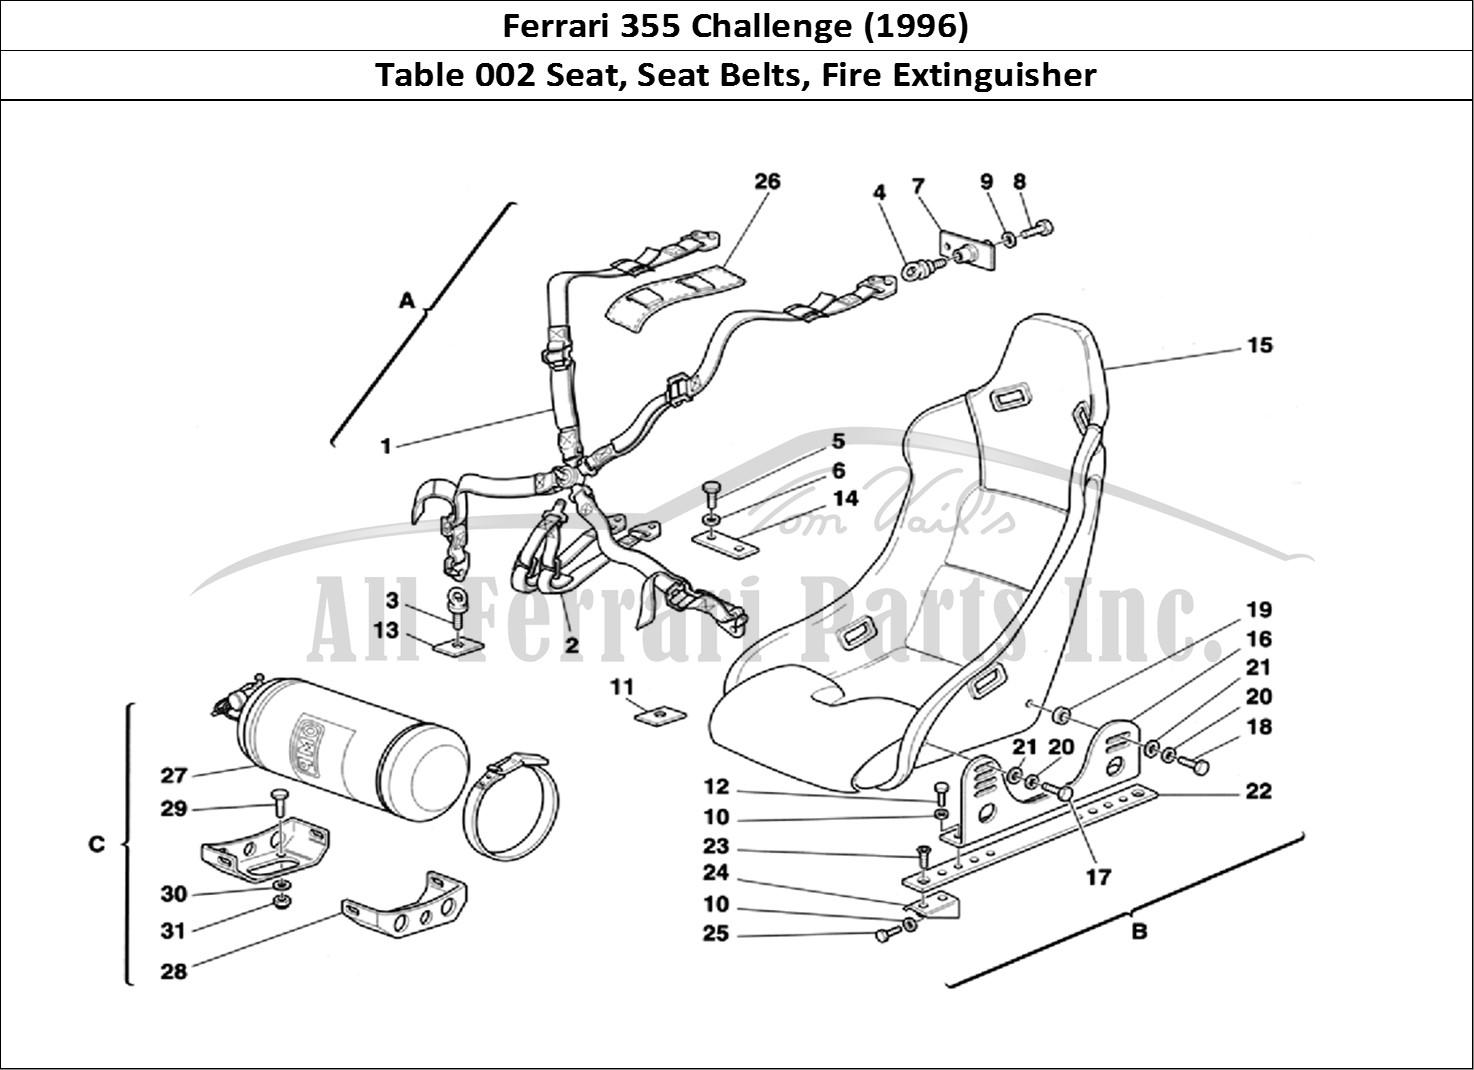 Buy Original Ferrari 355 Challenge 002 Seat Seat